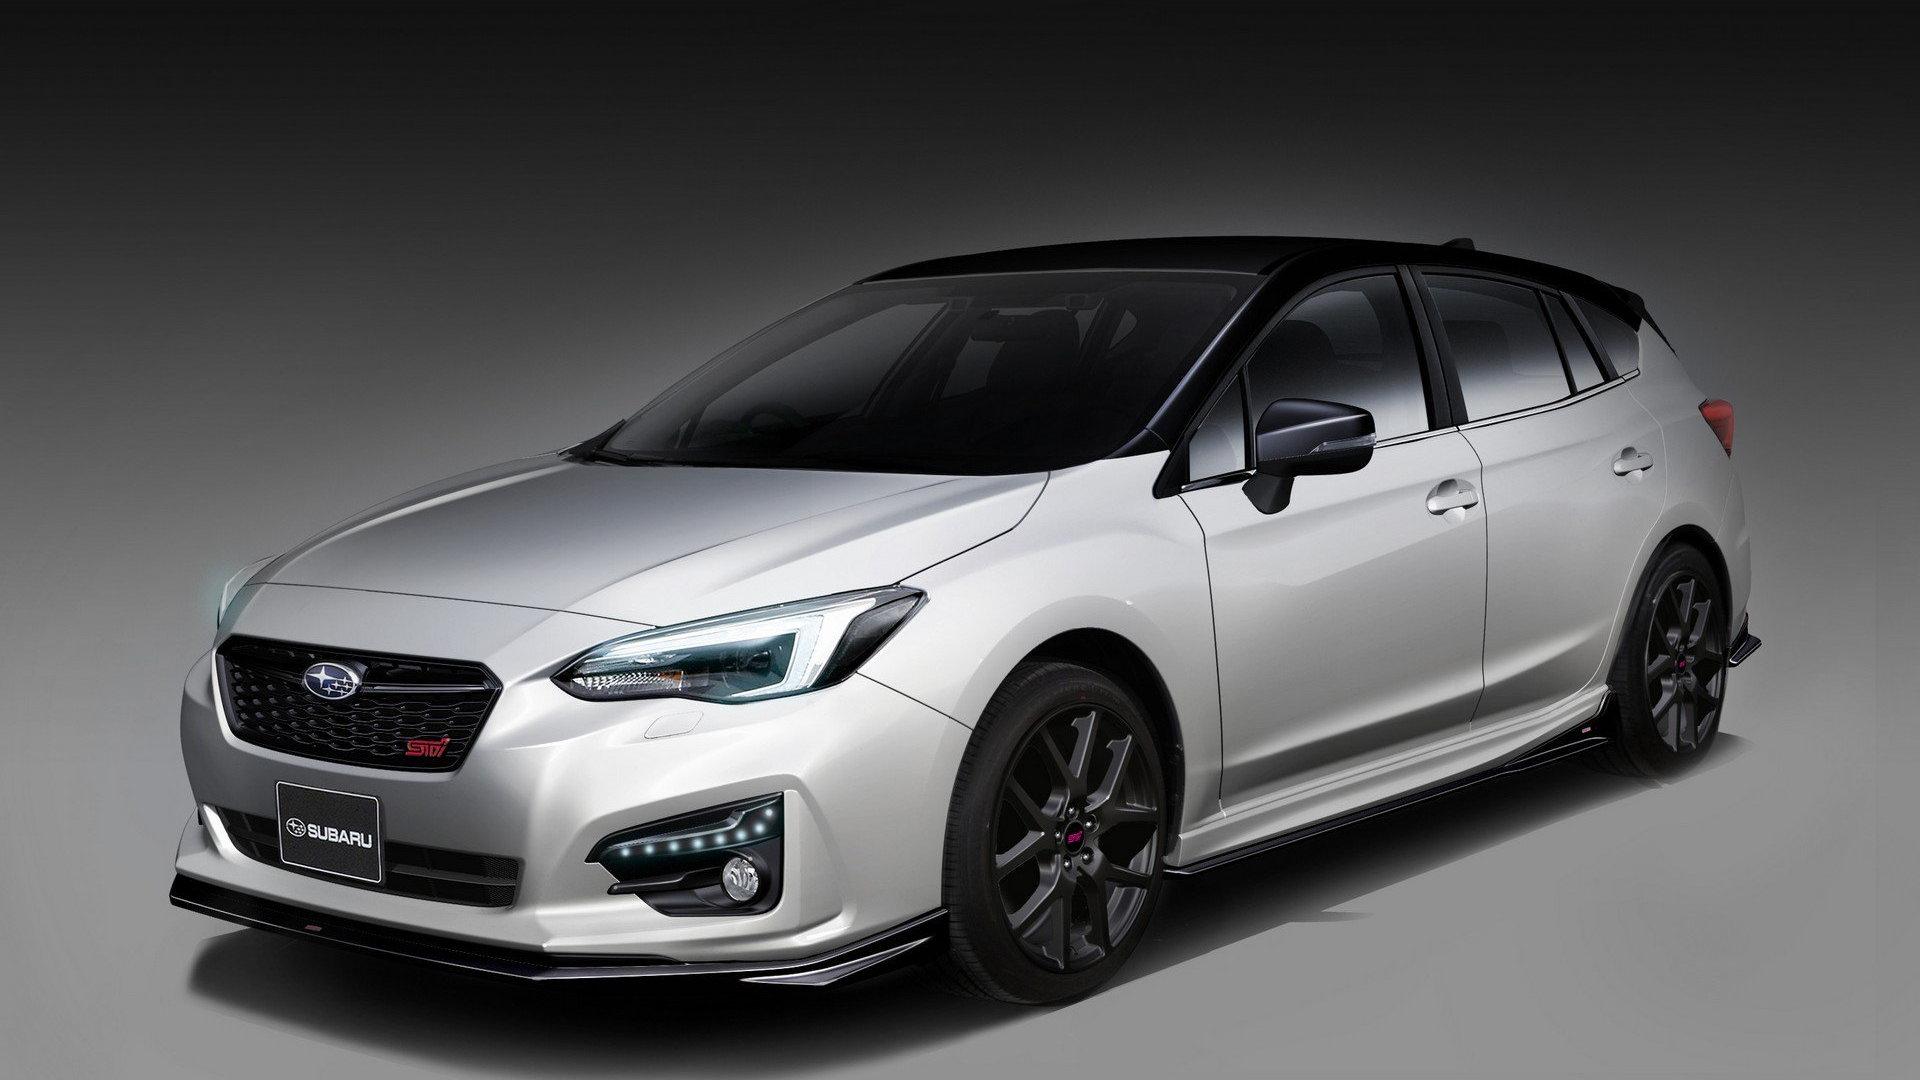 Subaru Impreza STI concept teased ahead of 2019 Tokyo Auto Salon debut